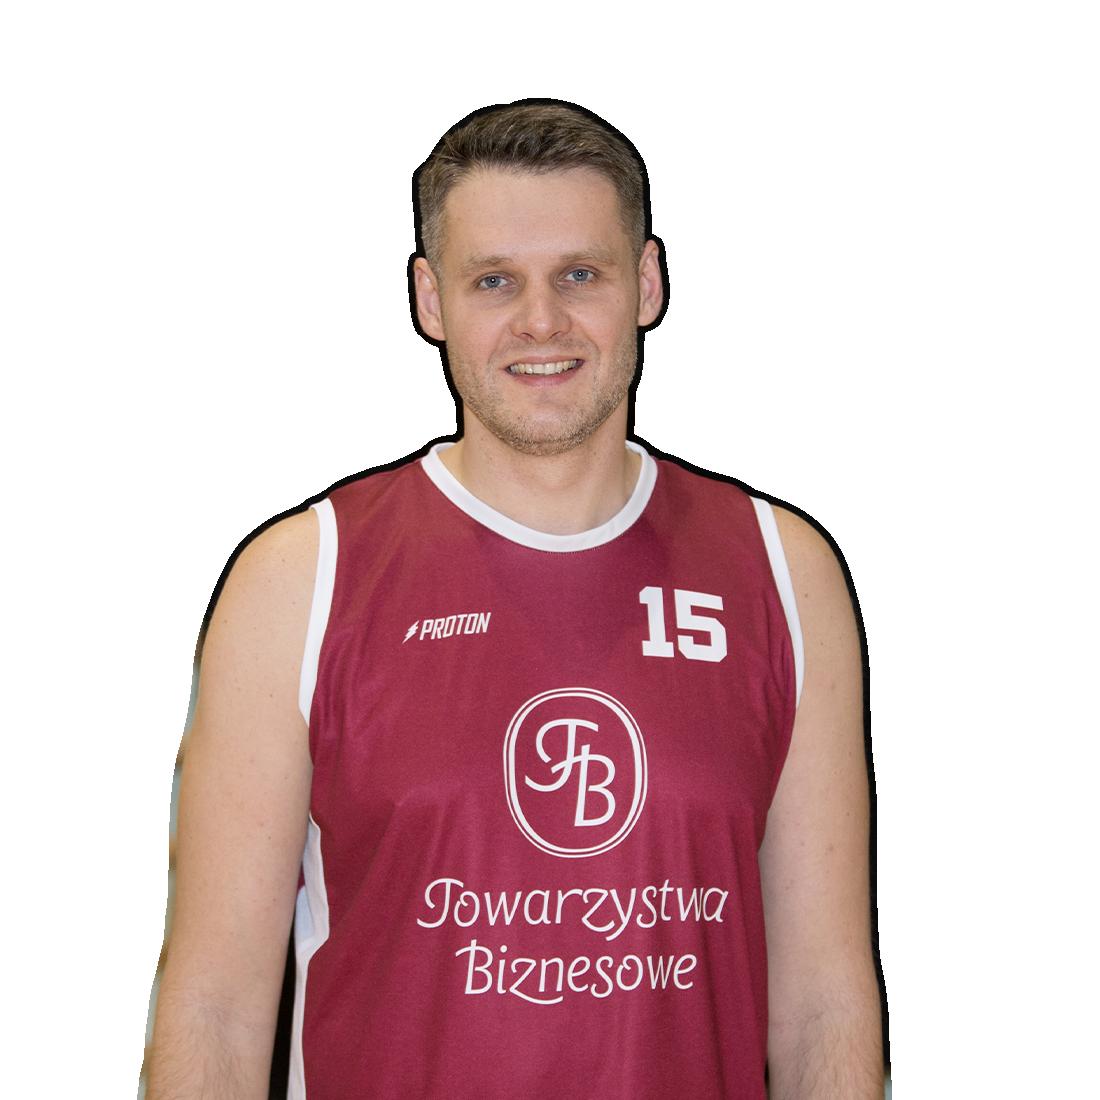 Dawid Jarecki